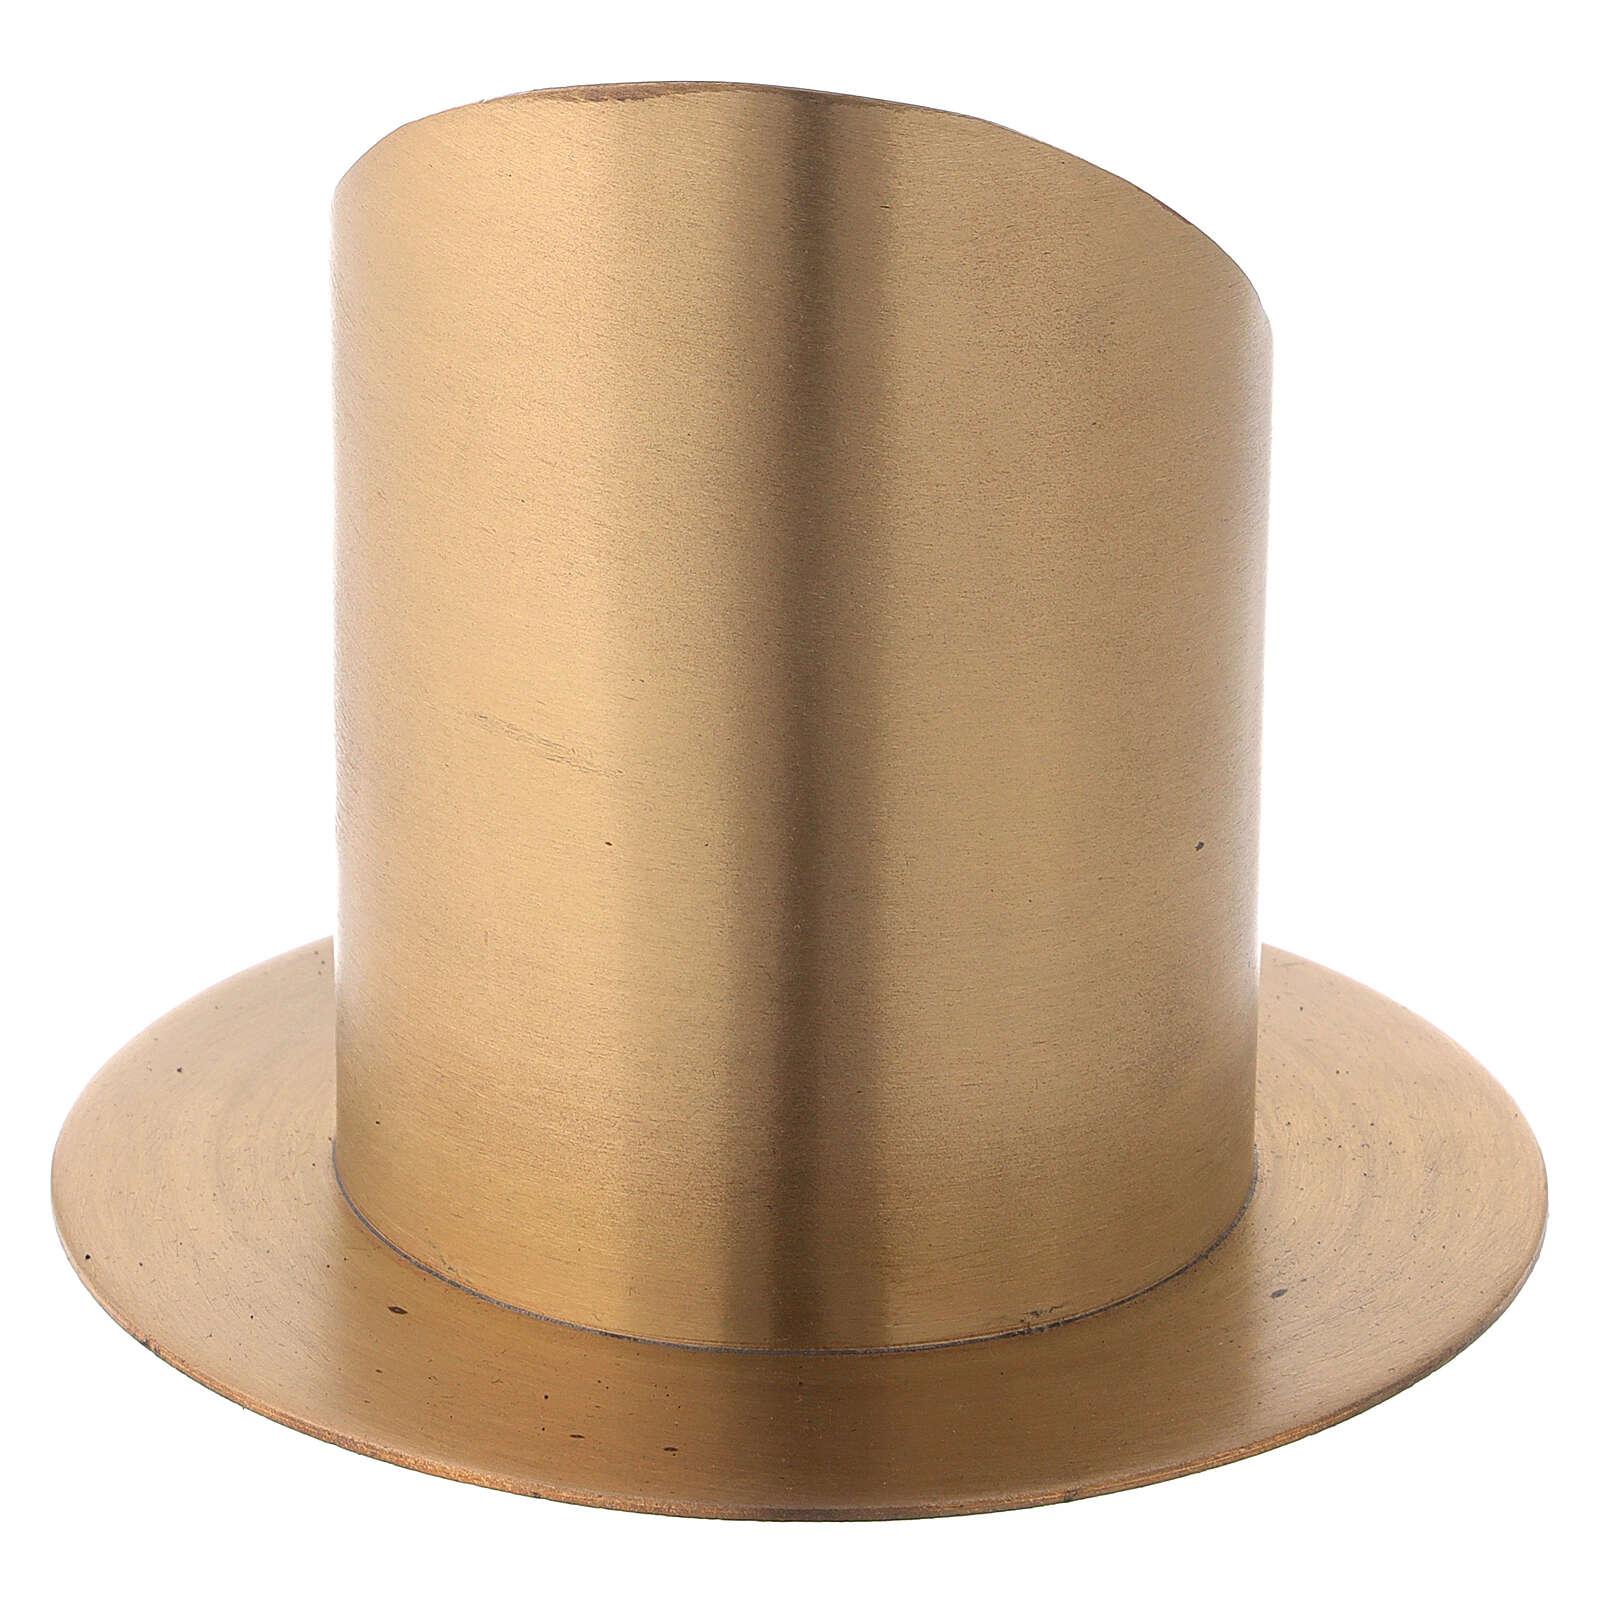 Portavela abierto latón niquelado satinado diámetro 8 cm 4